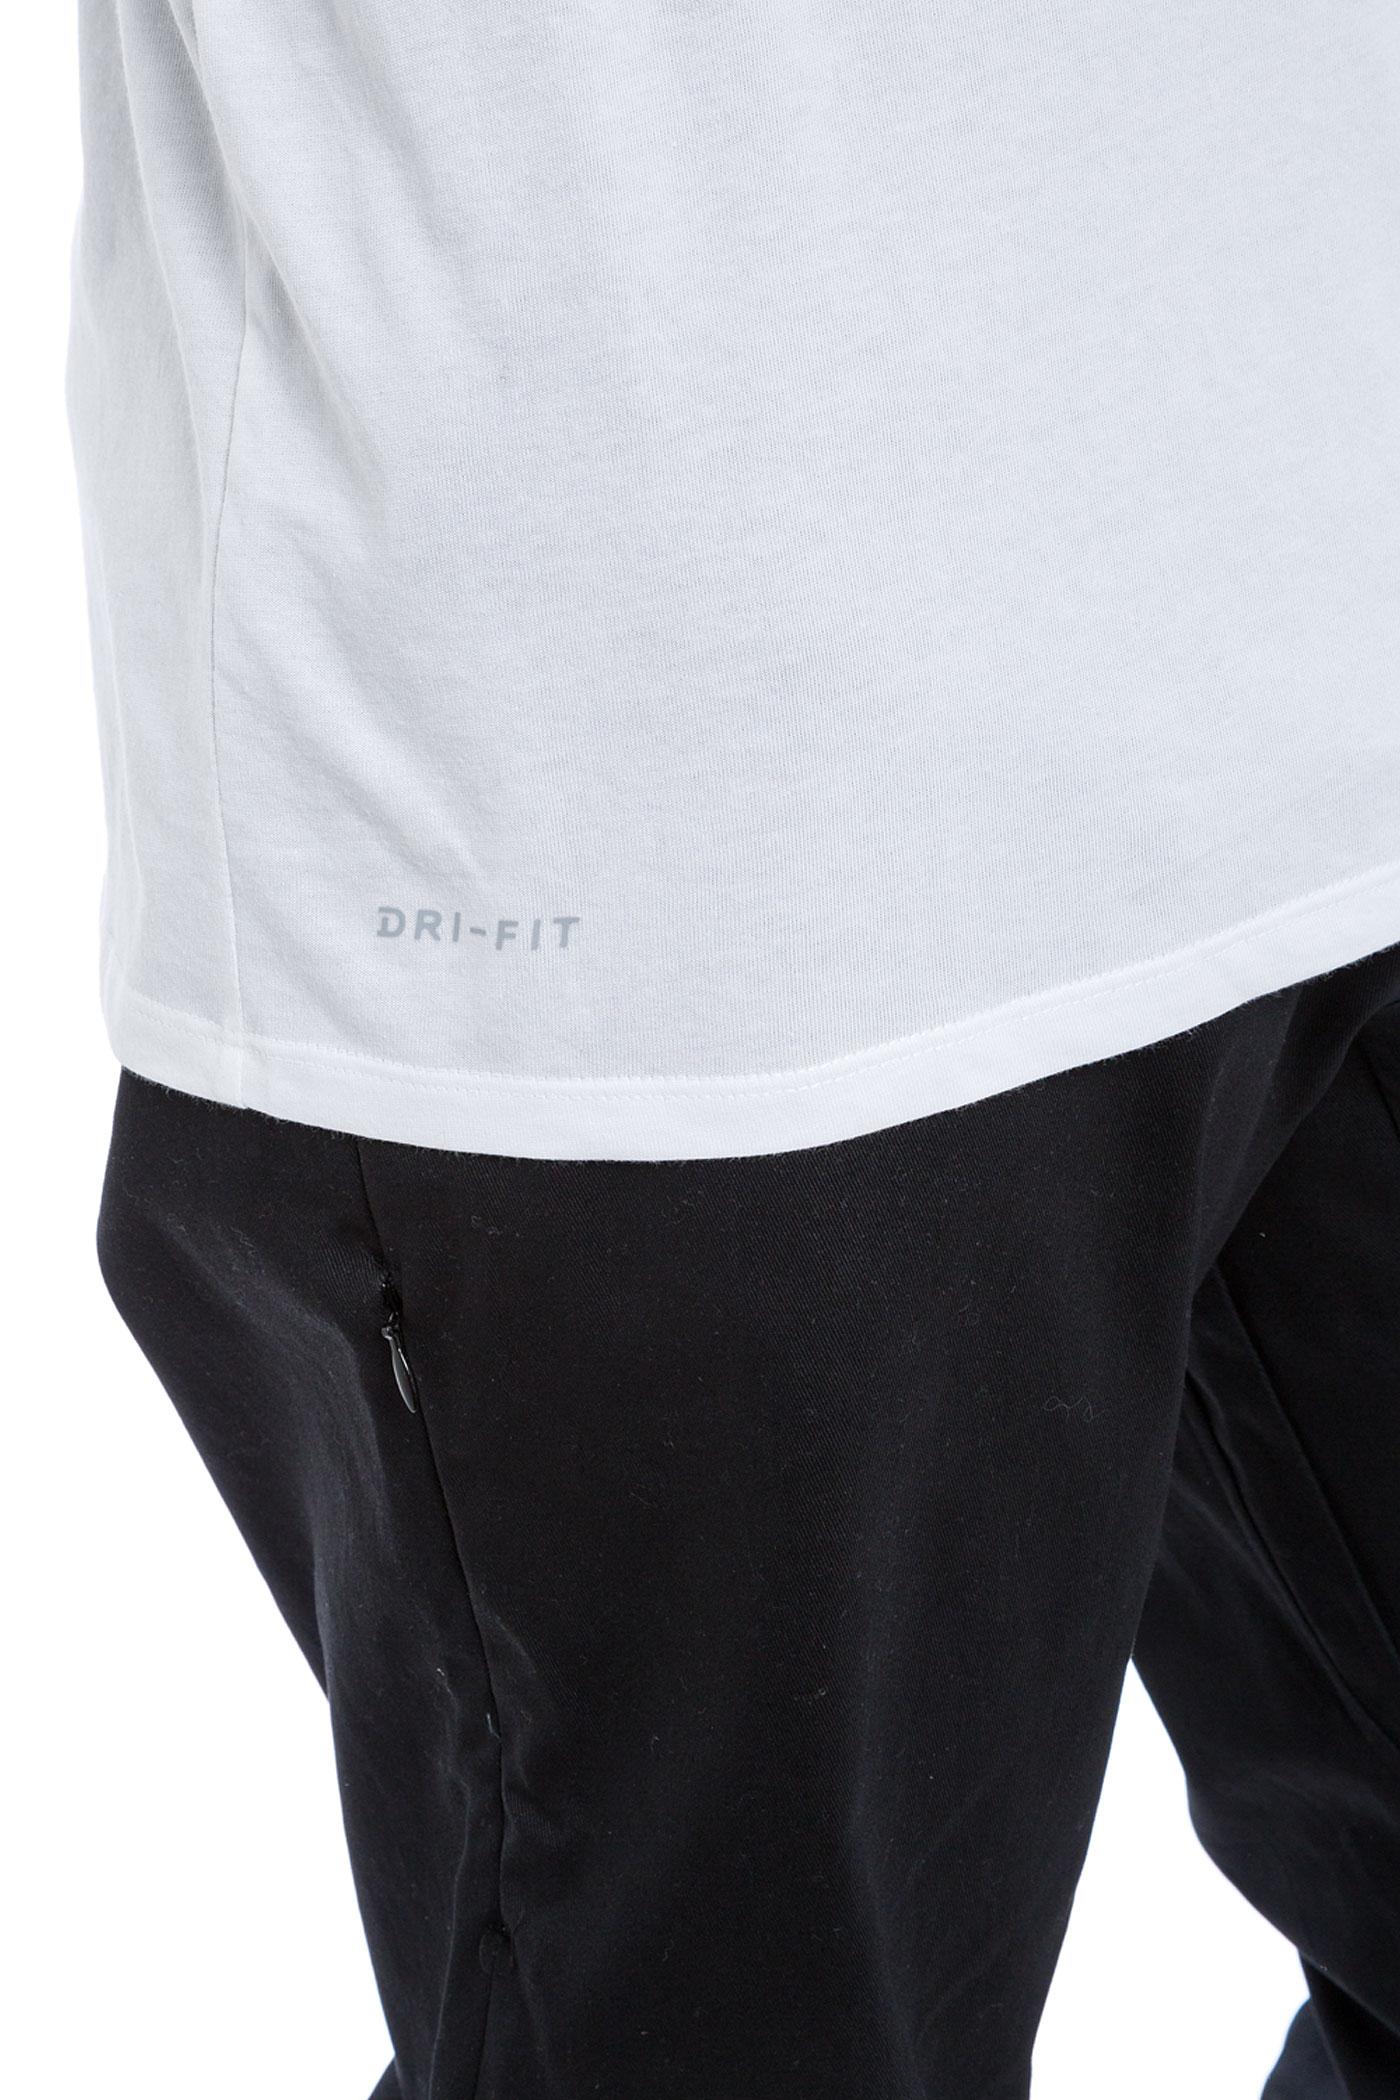 Nike sb logo t shirt white white black buy at skatedeluxe for Nike sb galaxy shirt